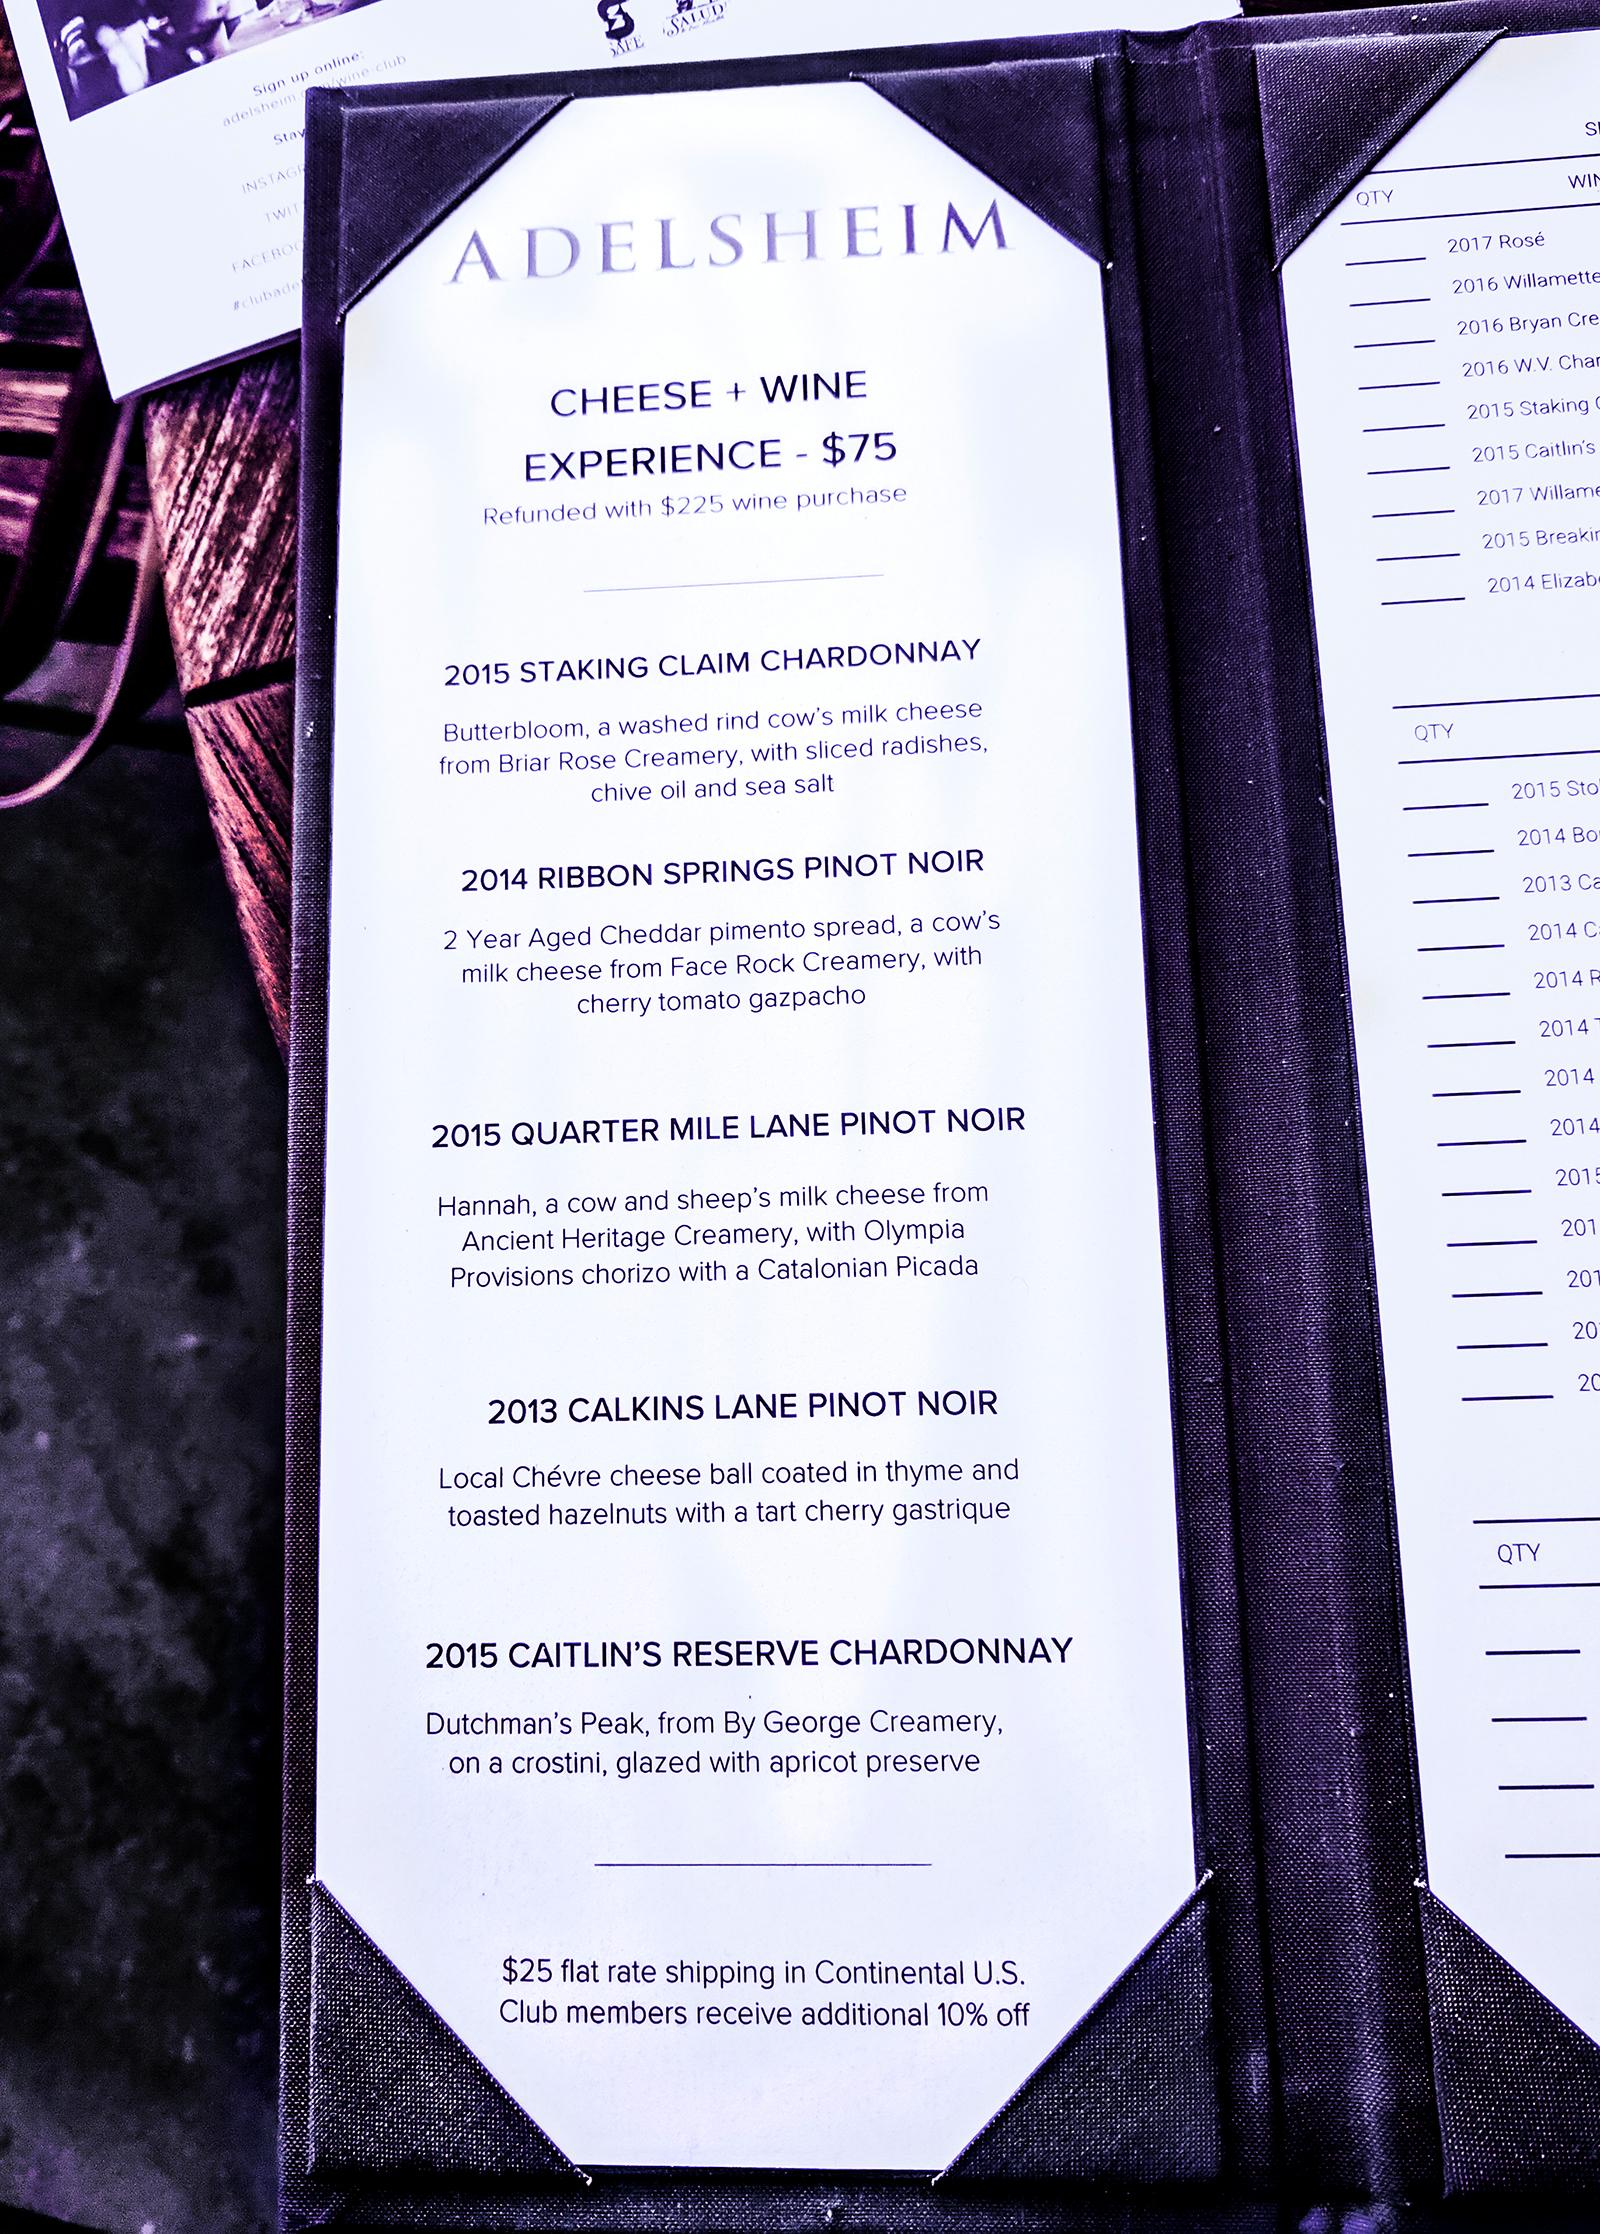 Adelsheim tasting menu